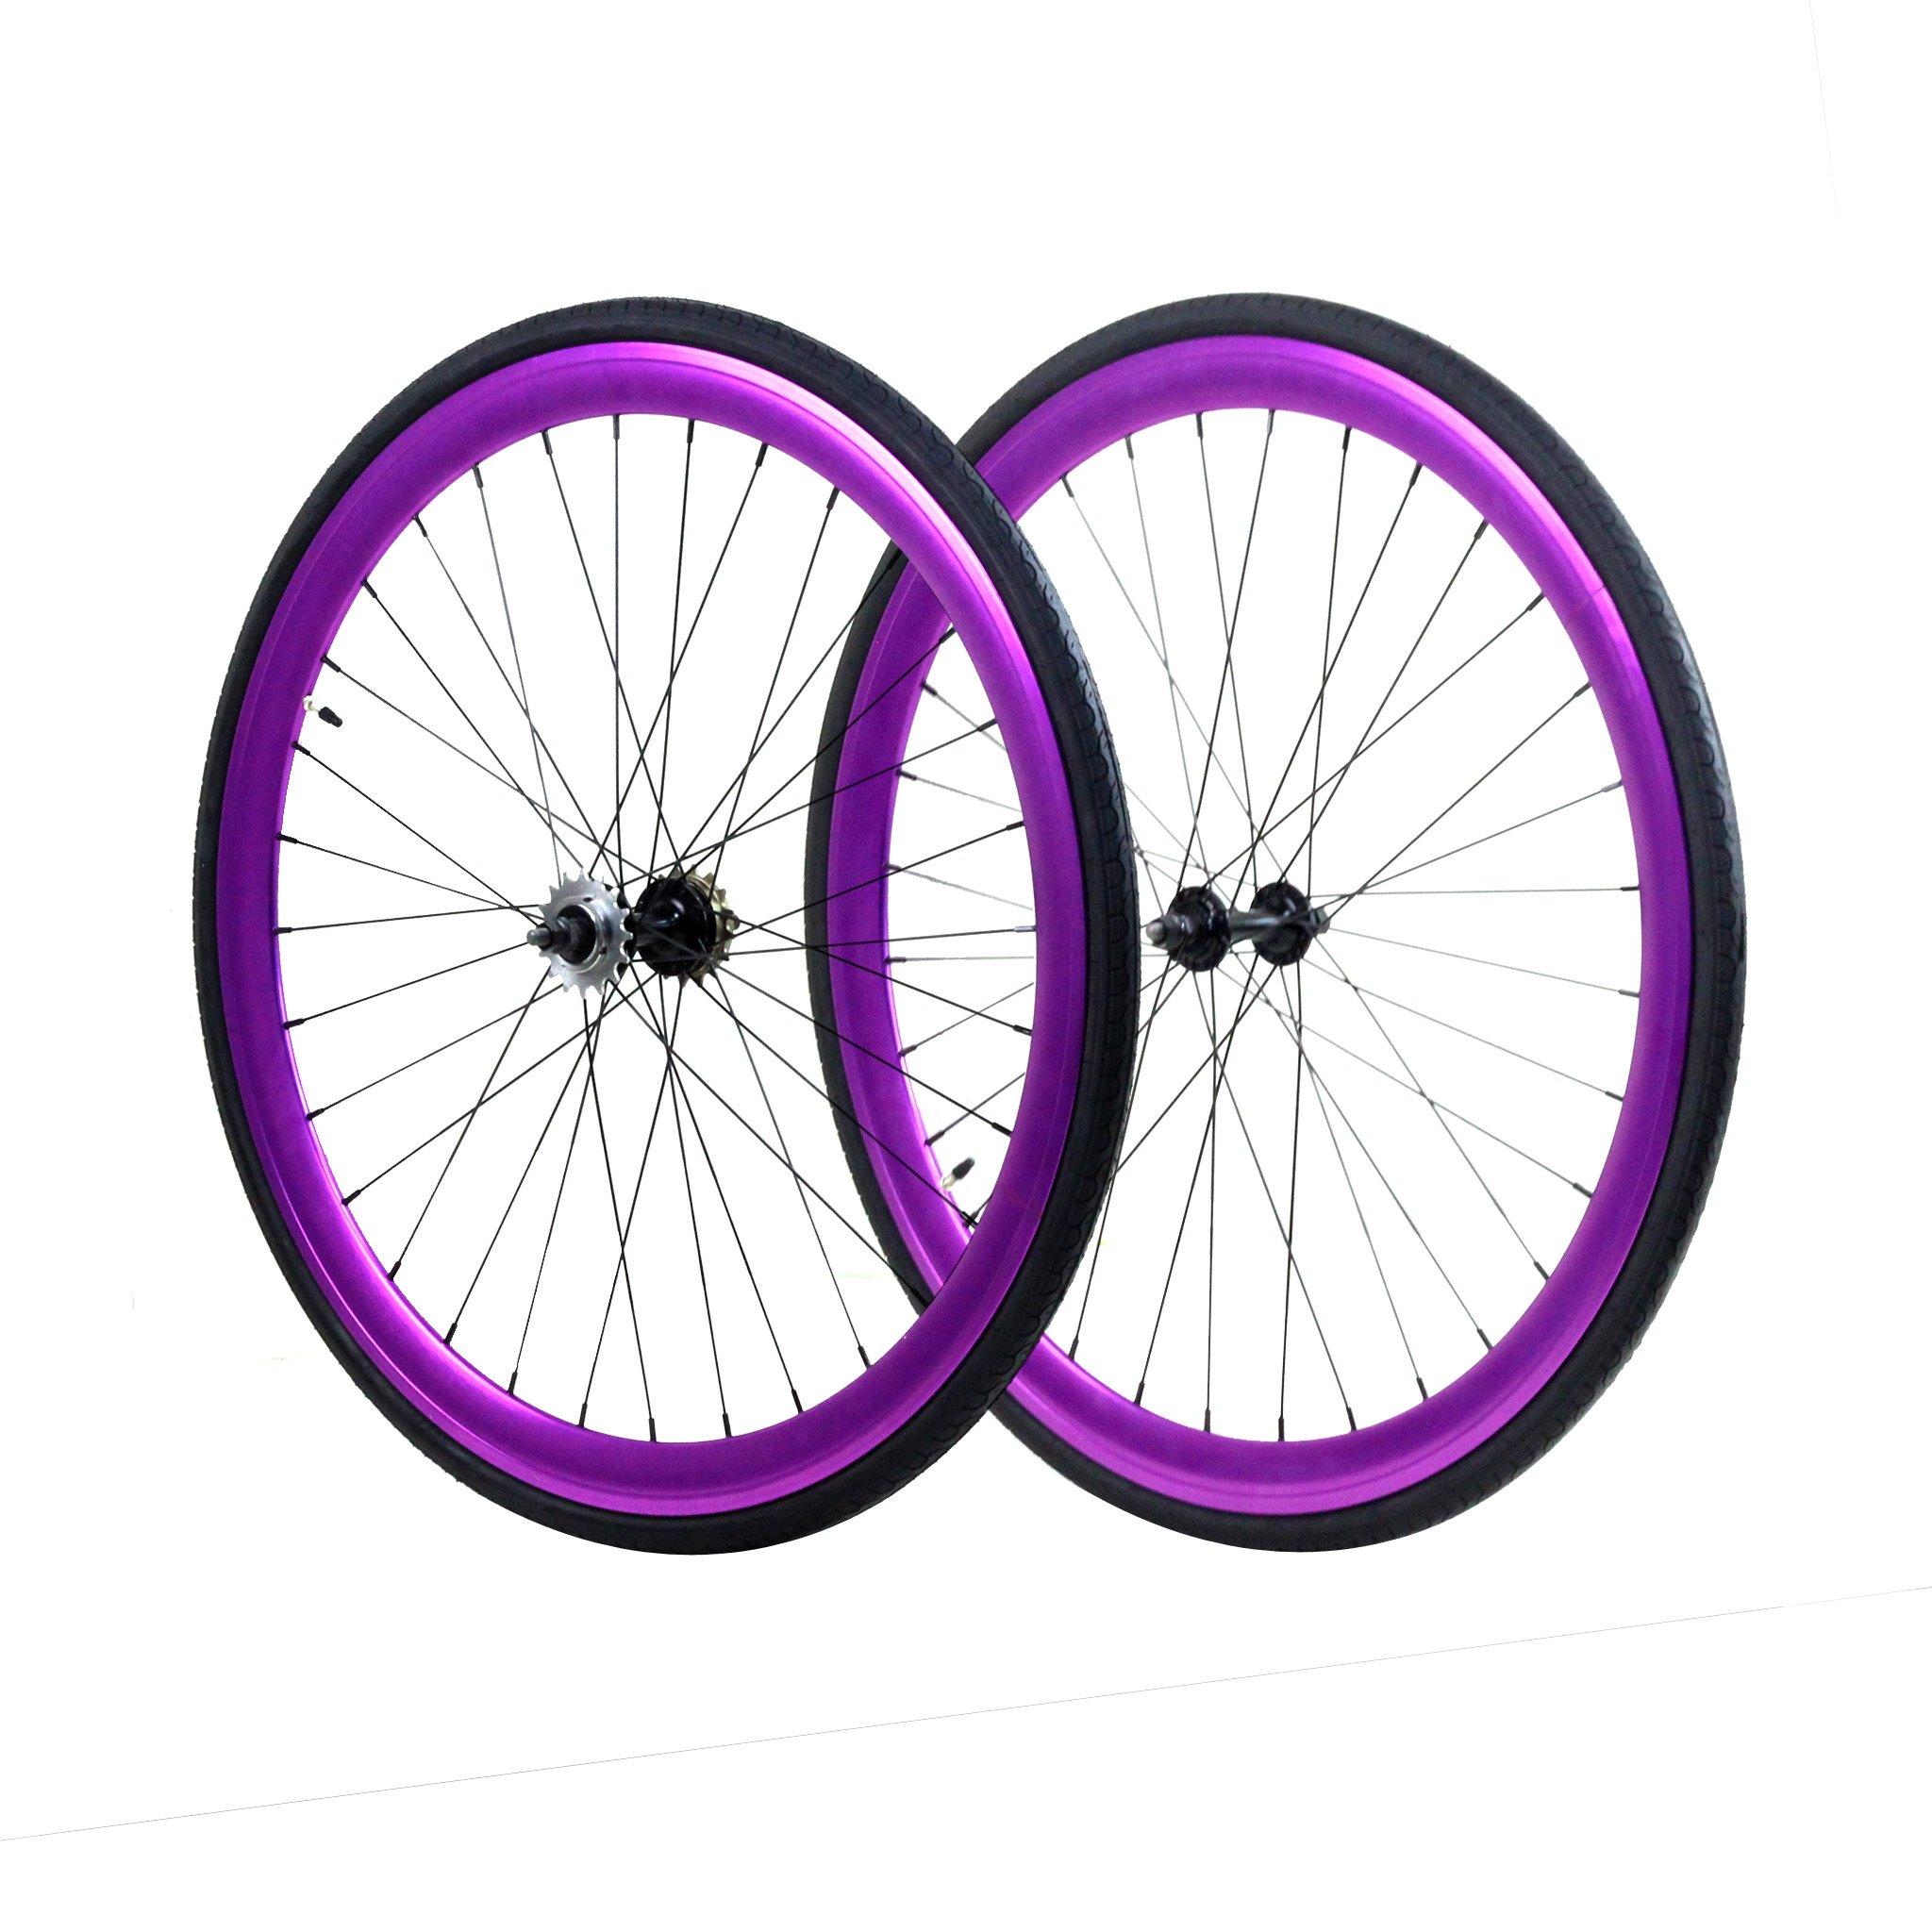 Fixie Wheels Set, Front and Fixed Gear Flip-Flop Rear, Purple